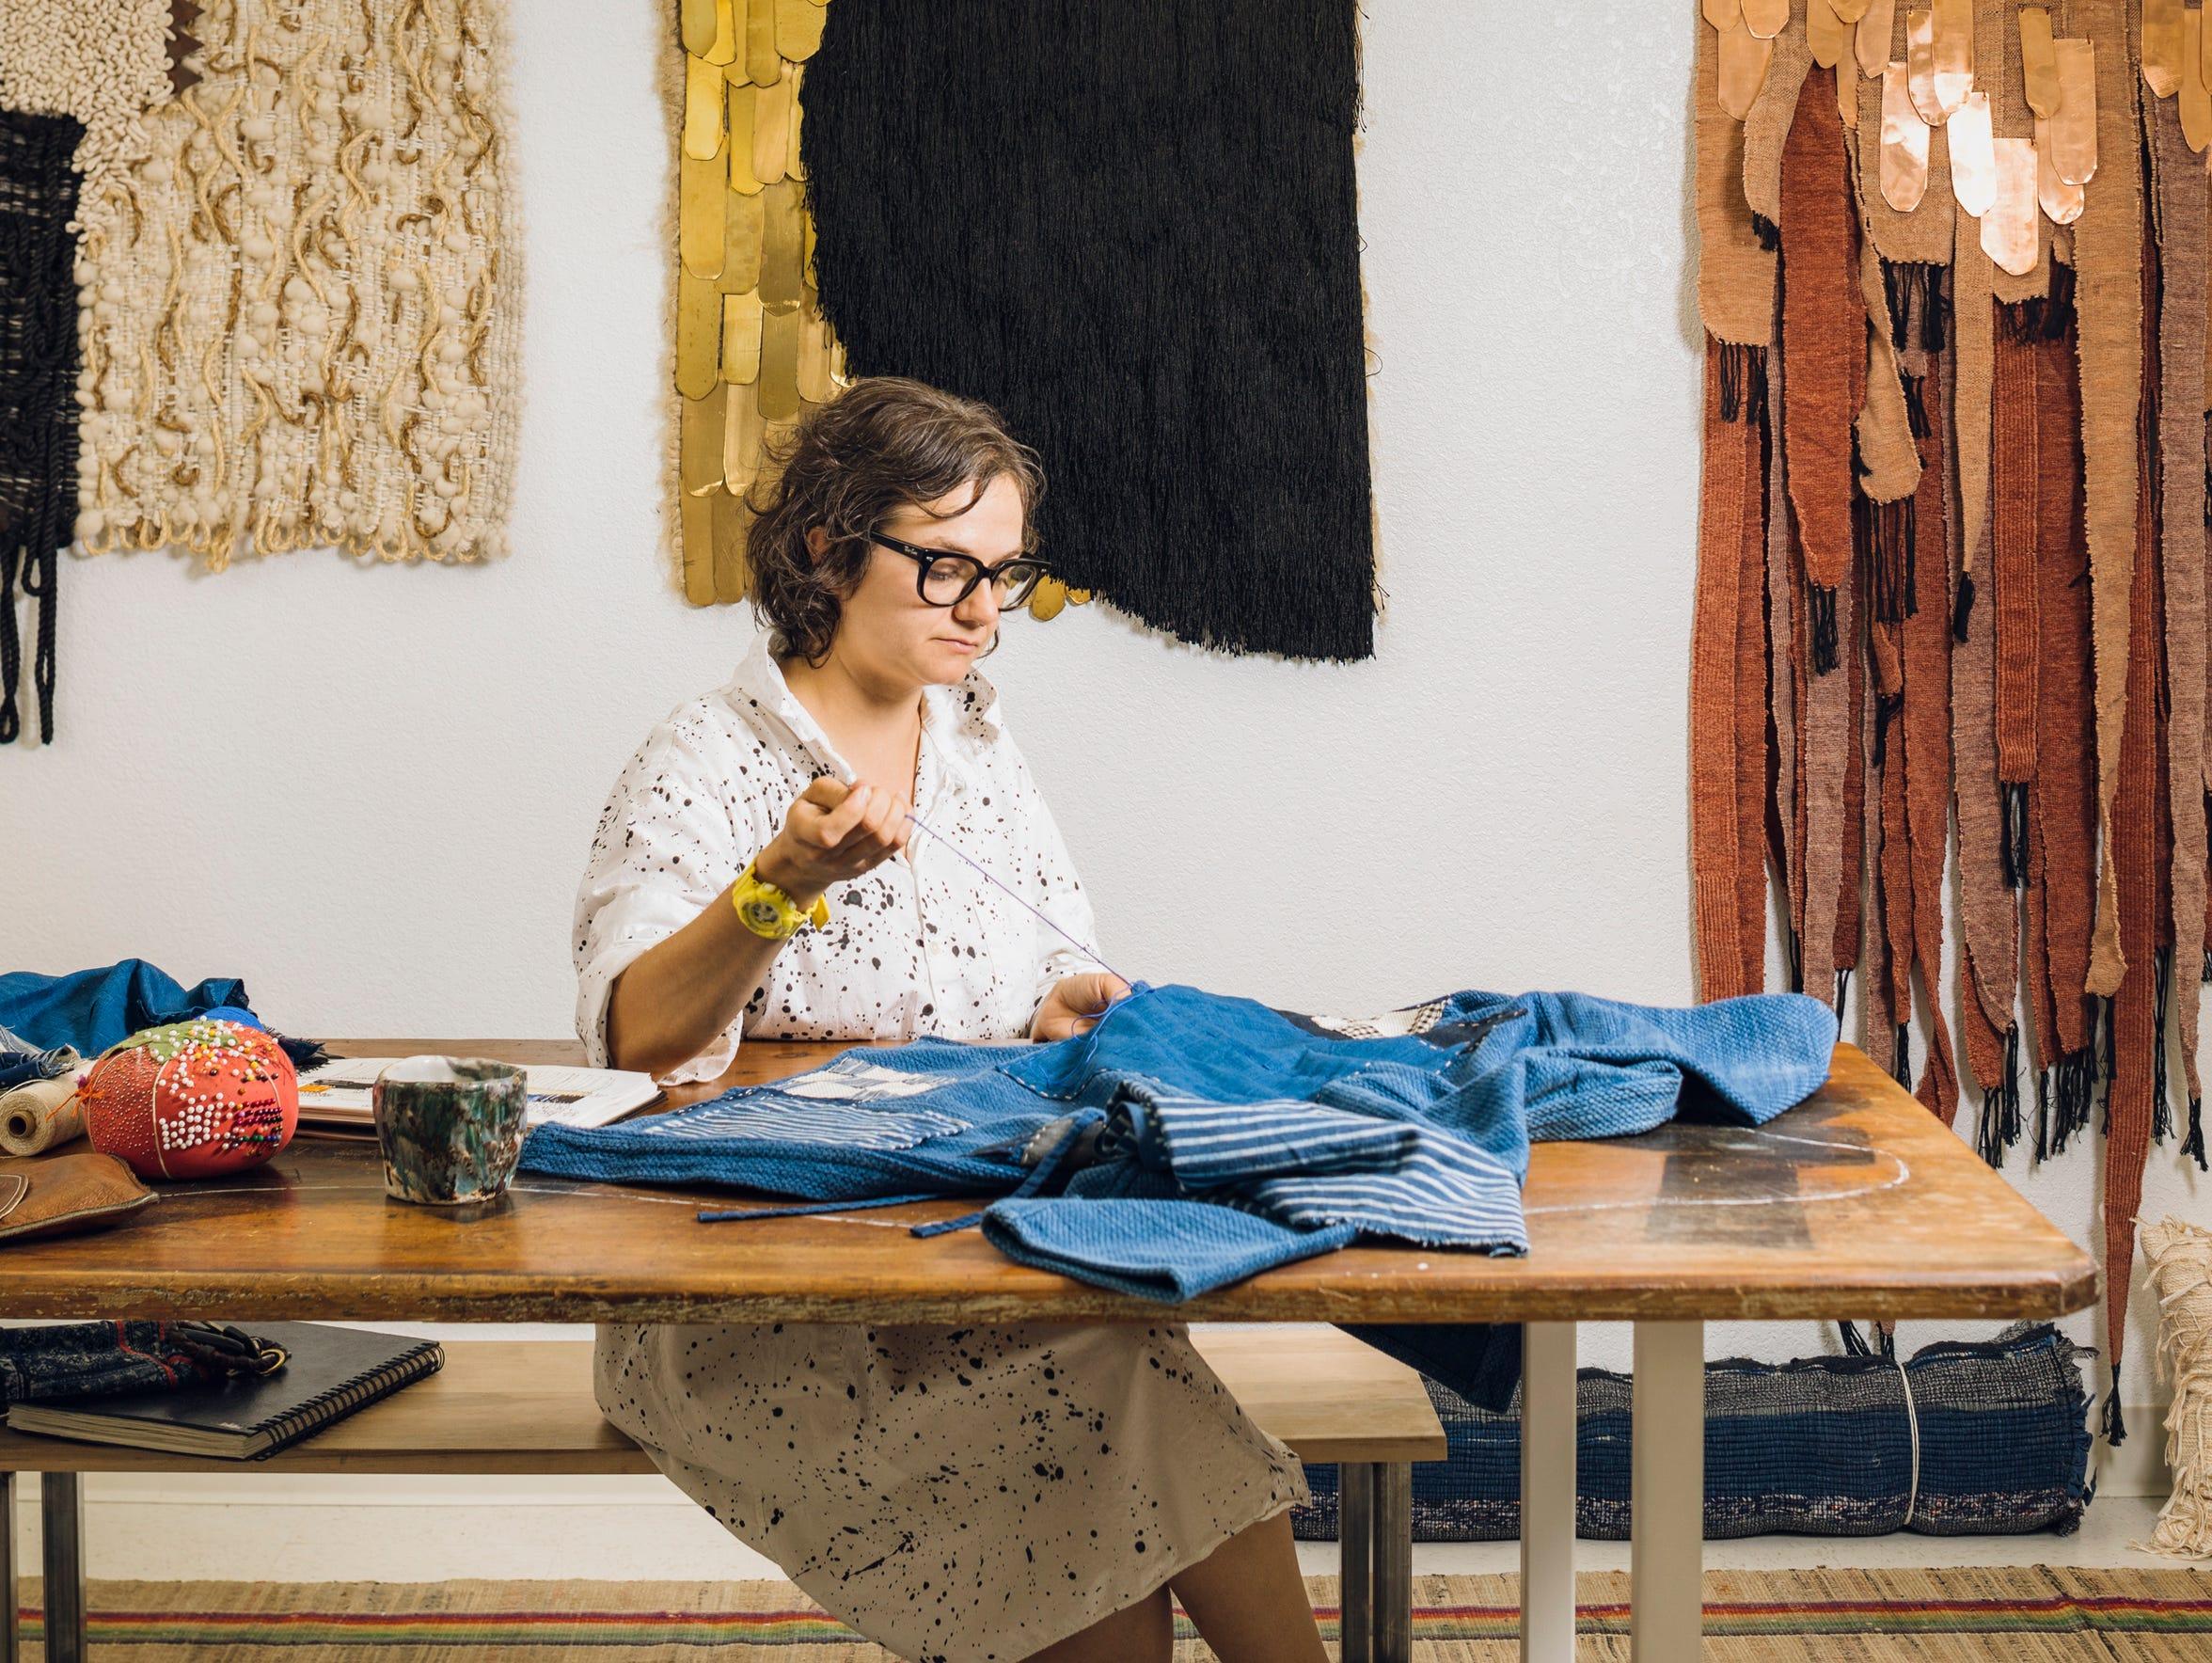 Textile artist Janelle Pietrzak